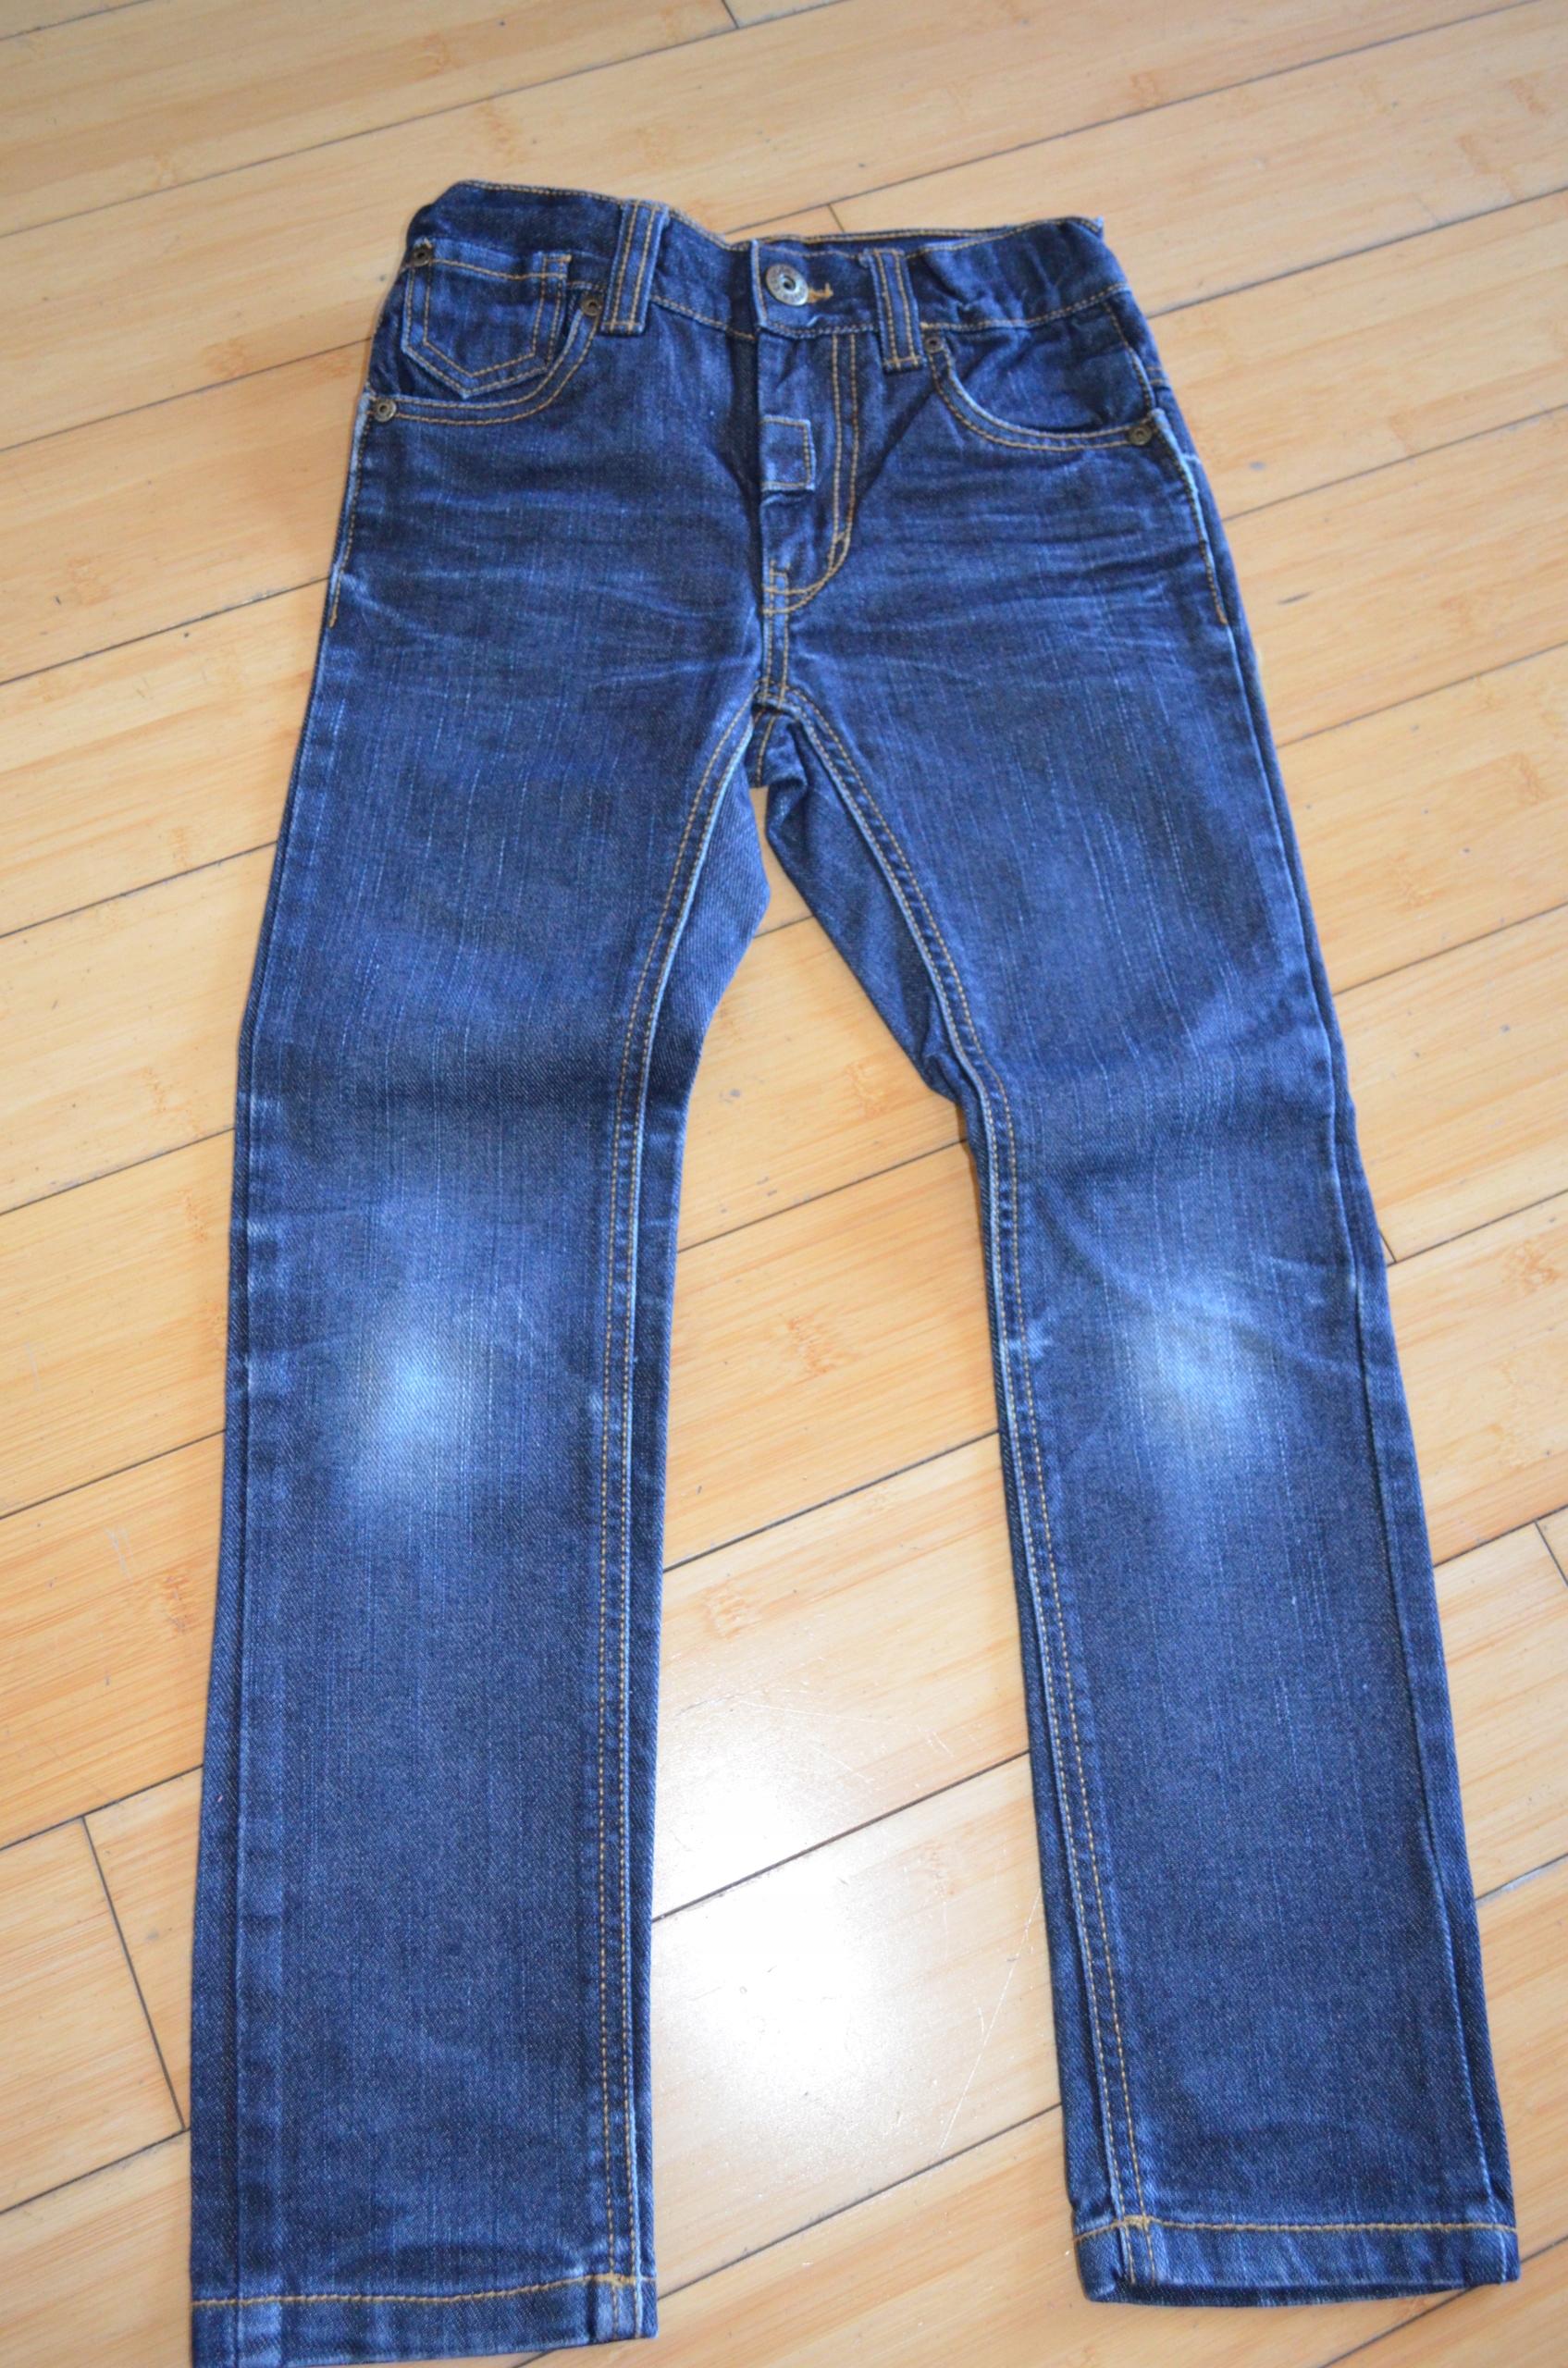 Spodnie Kappahl rozmiar 116 - 6-7 lat